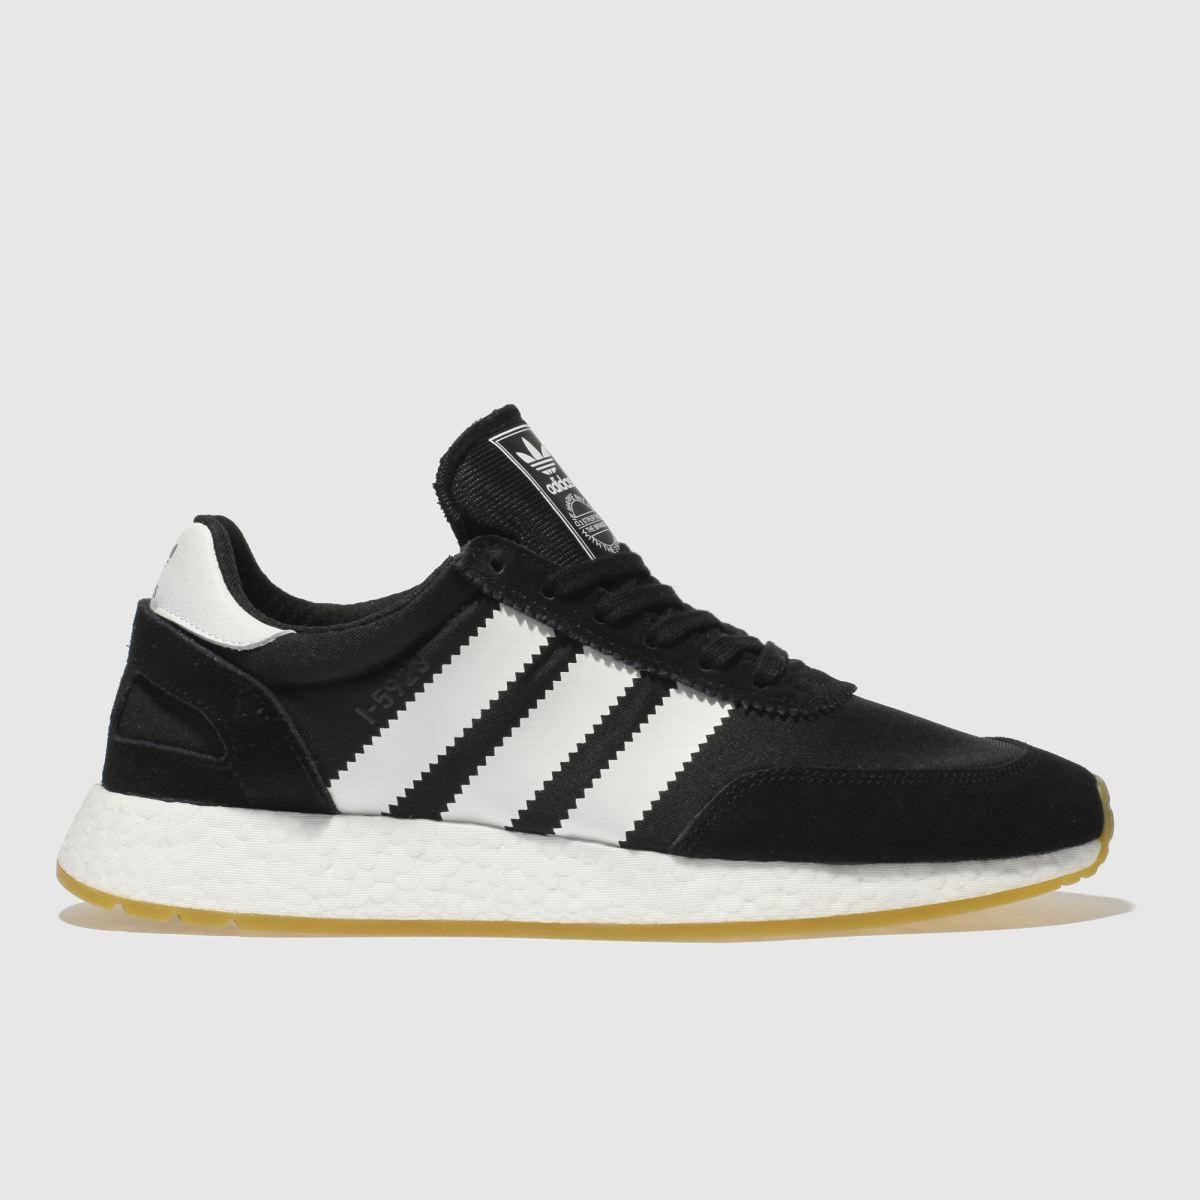 Adidas Black & White I-5923 Trainers